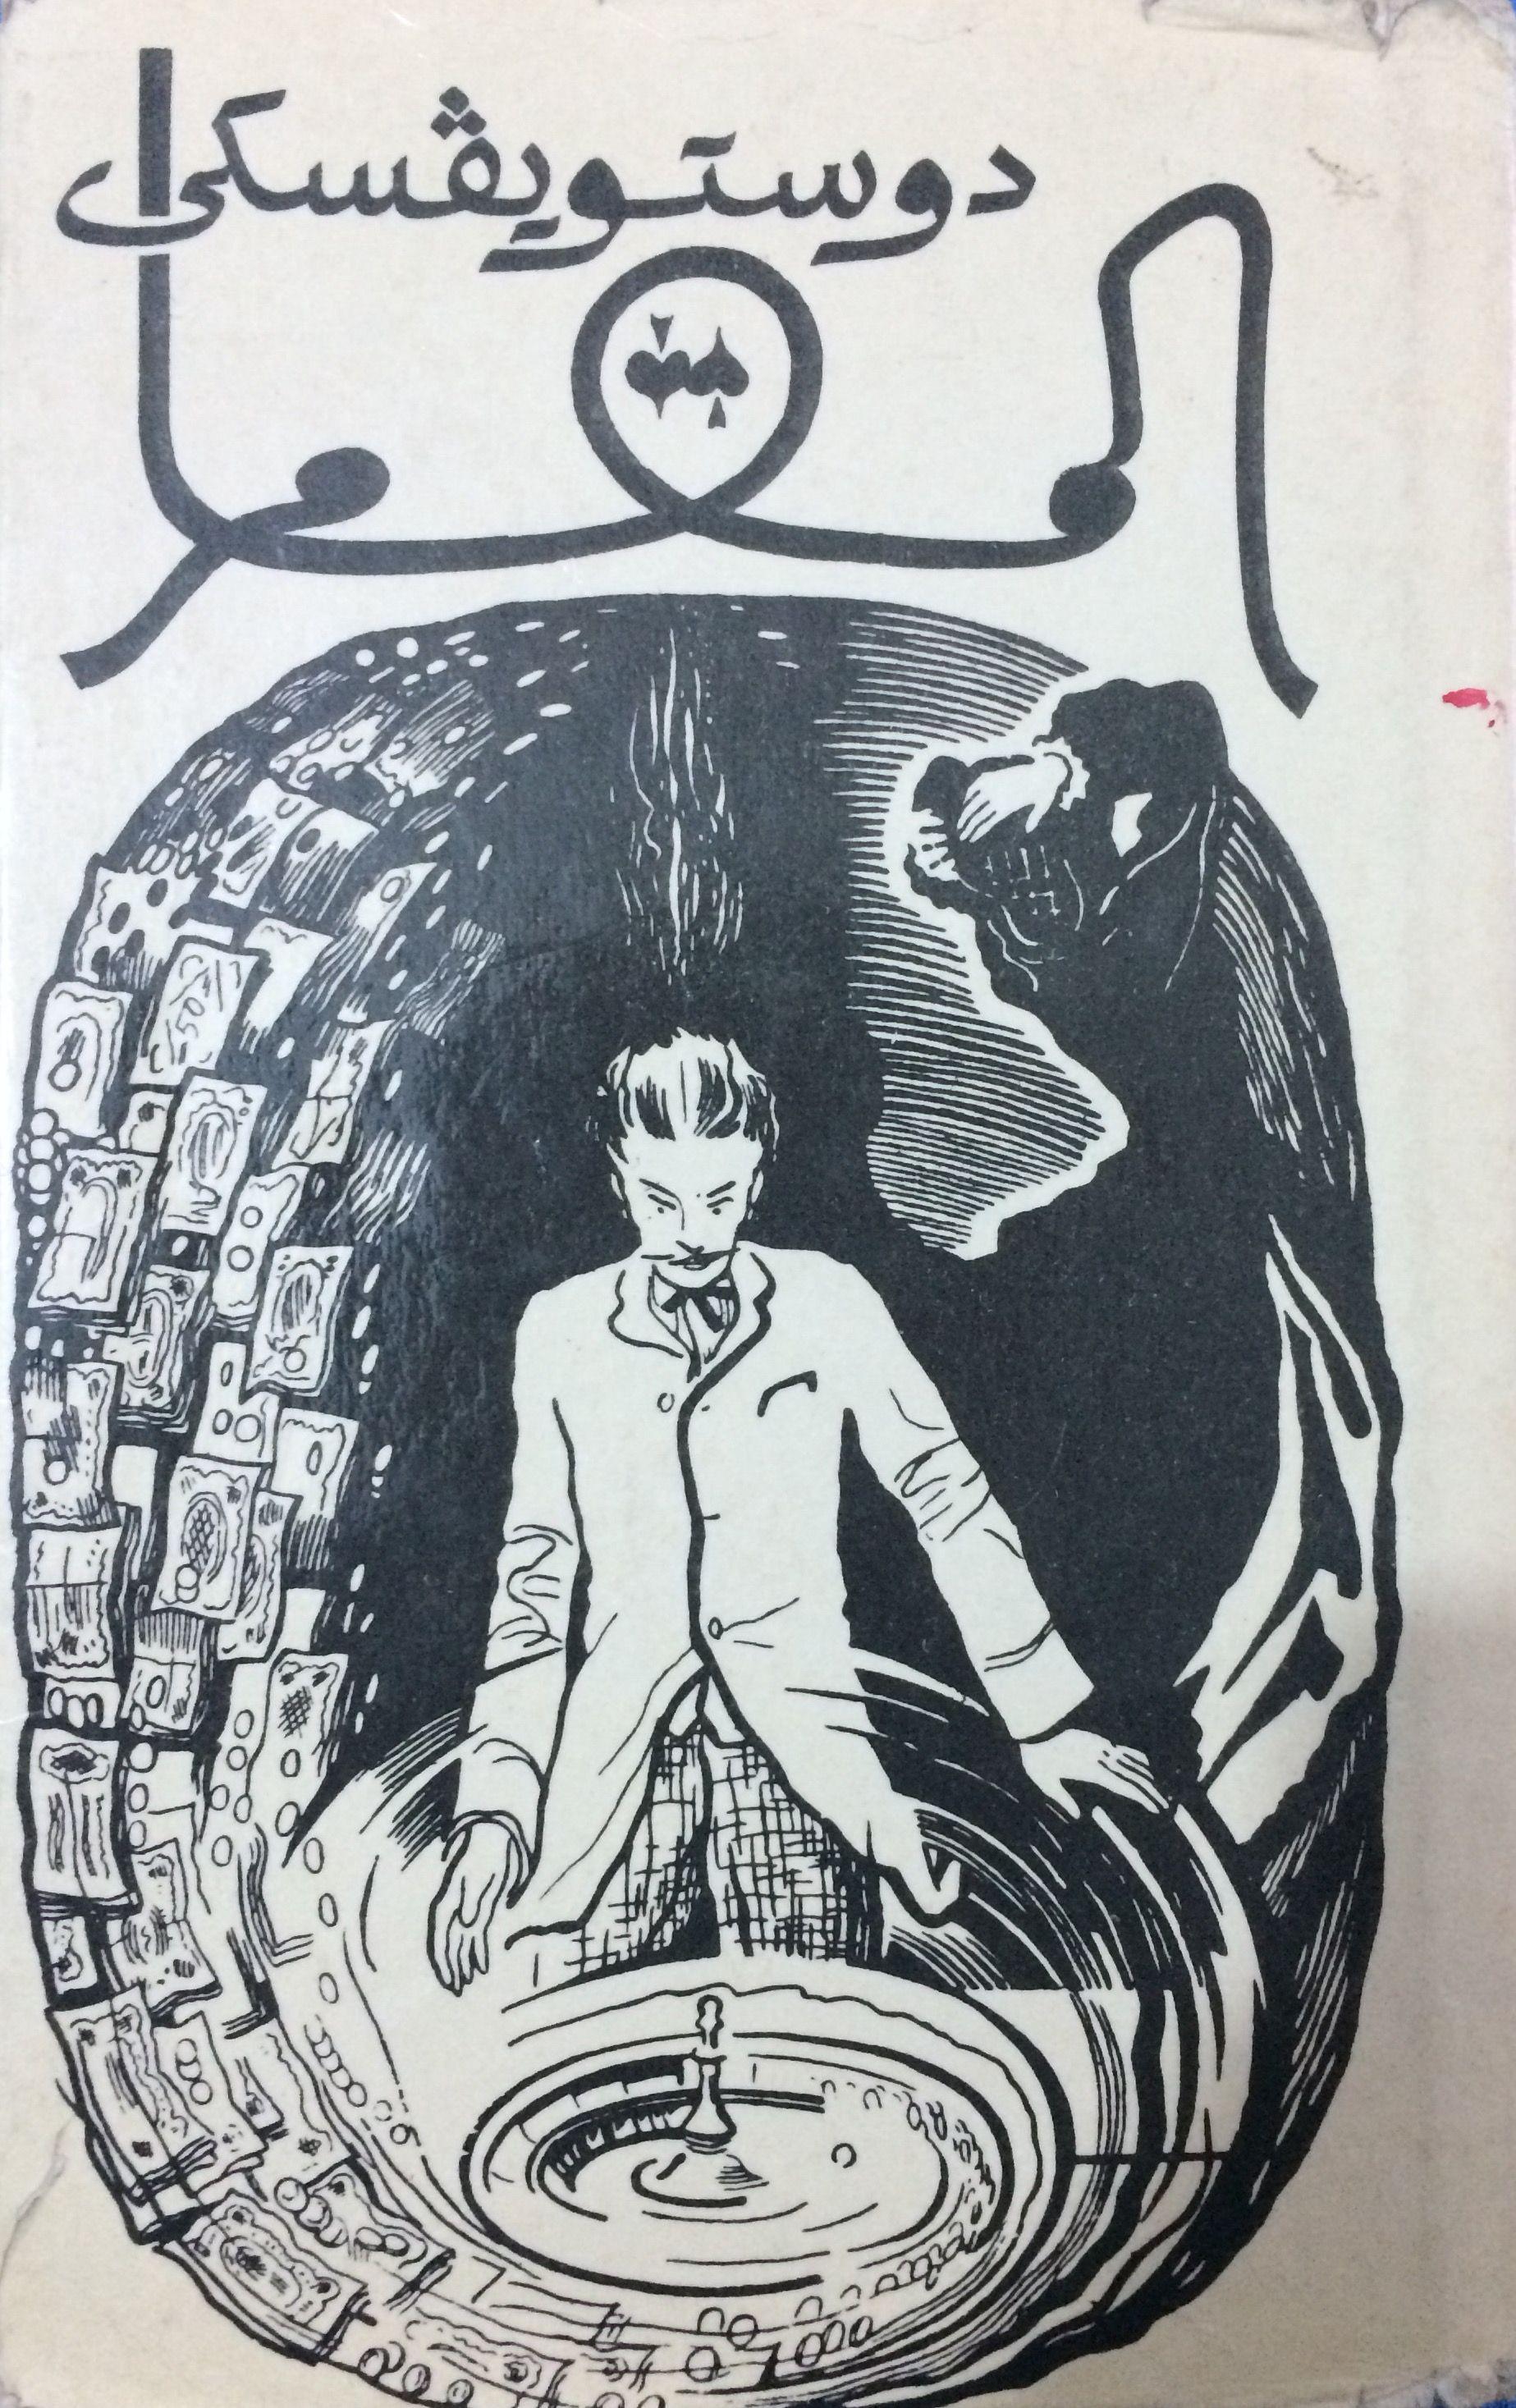 المقامر فيودر دوستويفسكي دار رادوغا موسكو Chapter Books Dostoyevsky Ebook